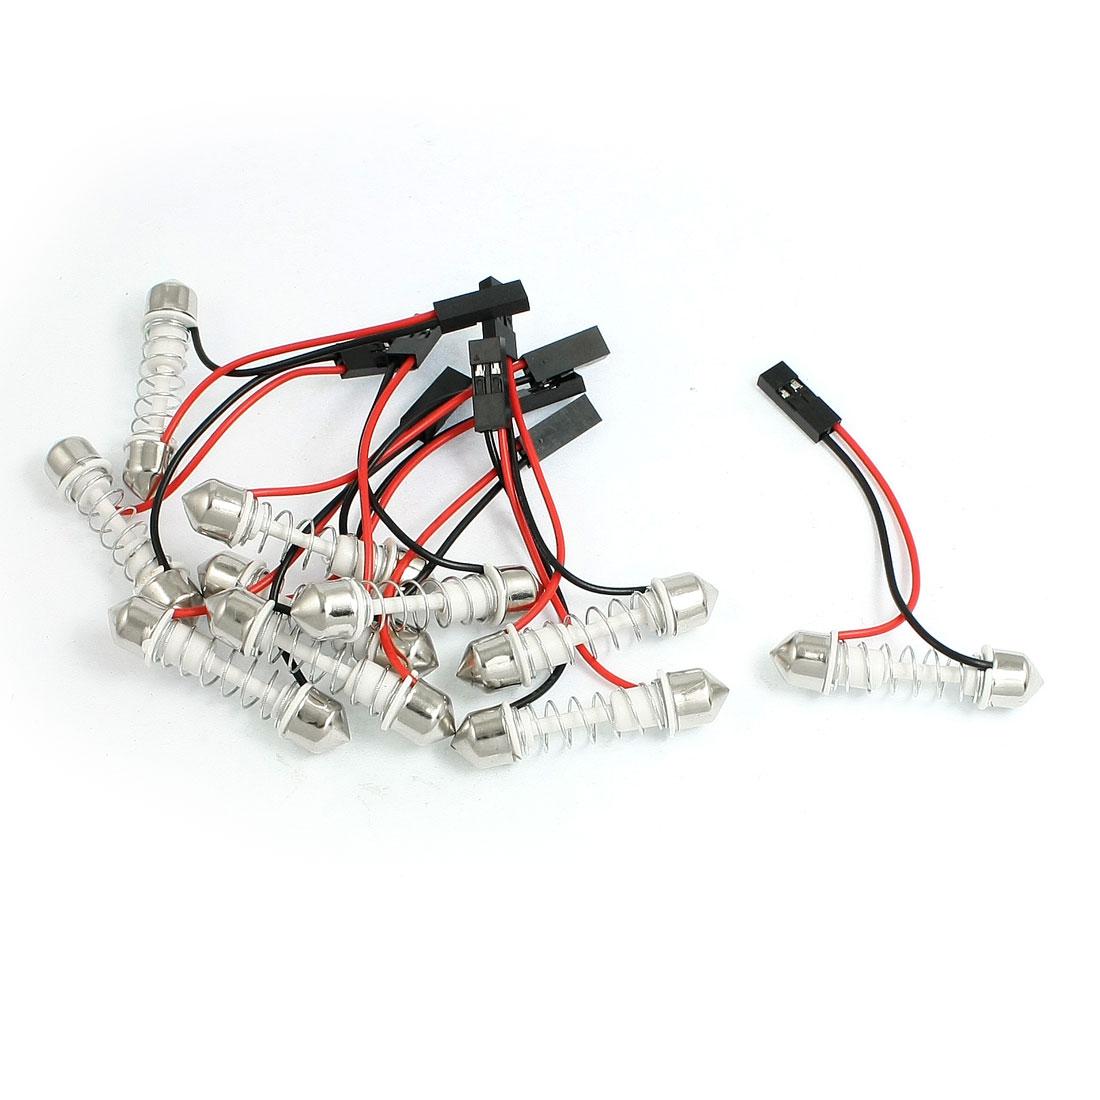 10 x 29-40mm Spring Car Interior Dome Festoon Bulb Base Light Adapter